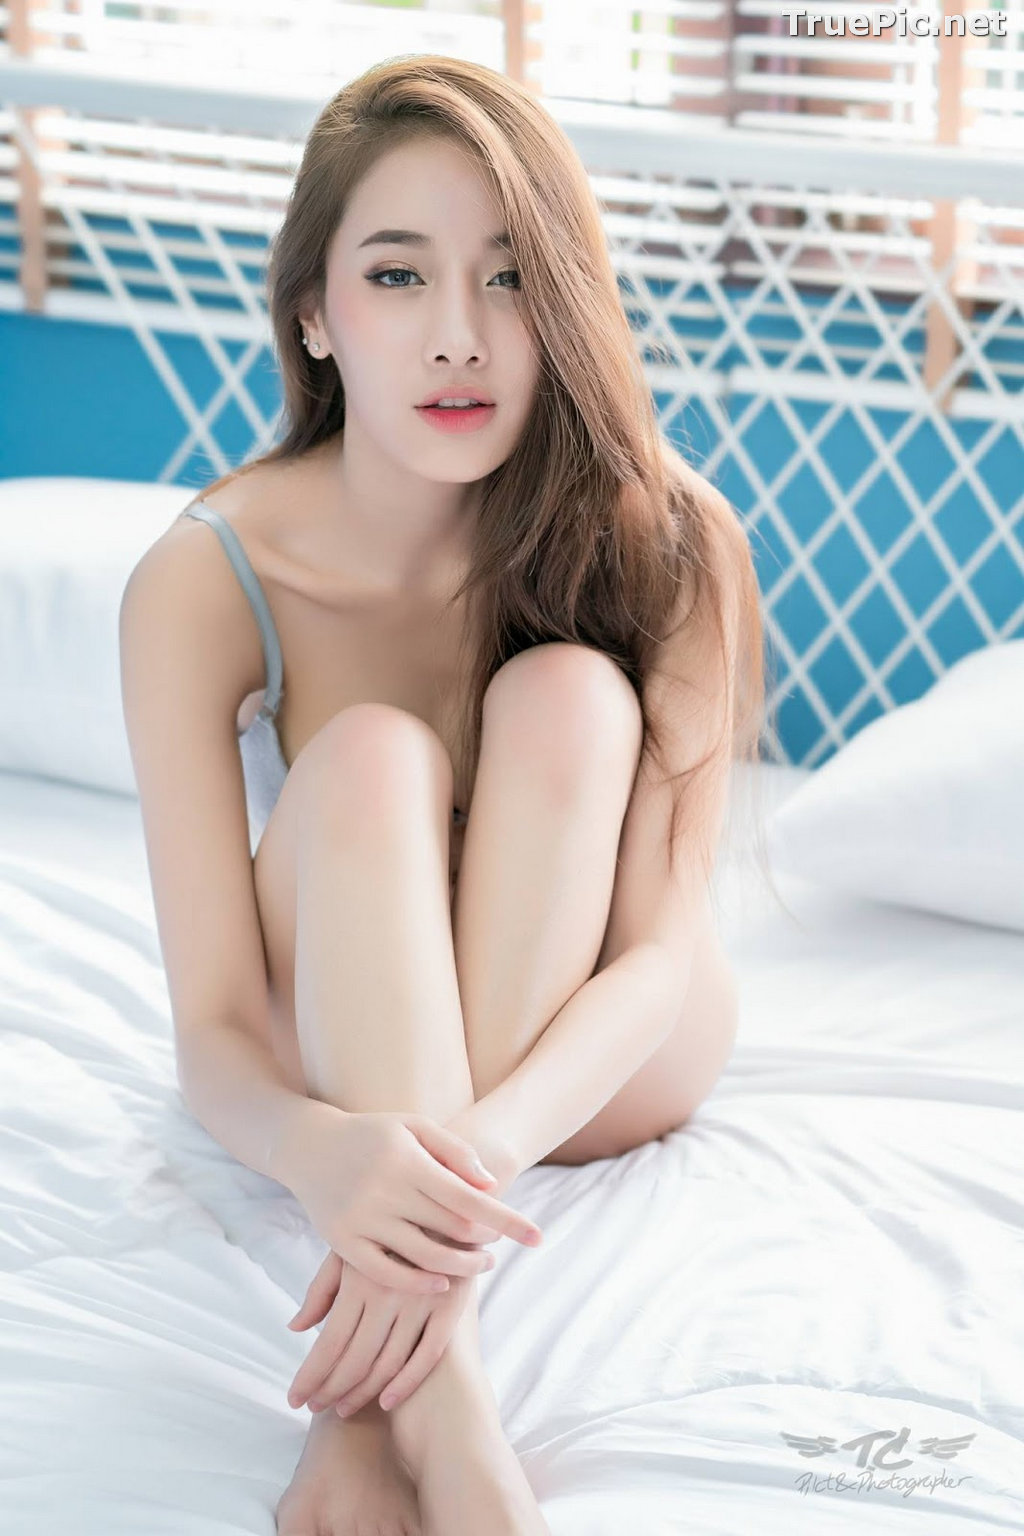 Image Thailand Sexy Model - Pichana Yoosuk - Waiting For Love - TruePic.net - Picture-3